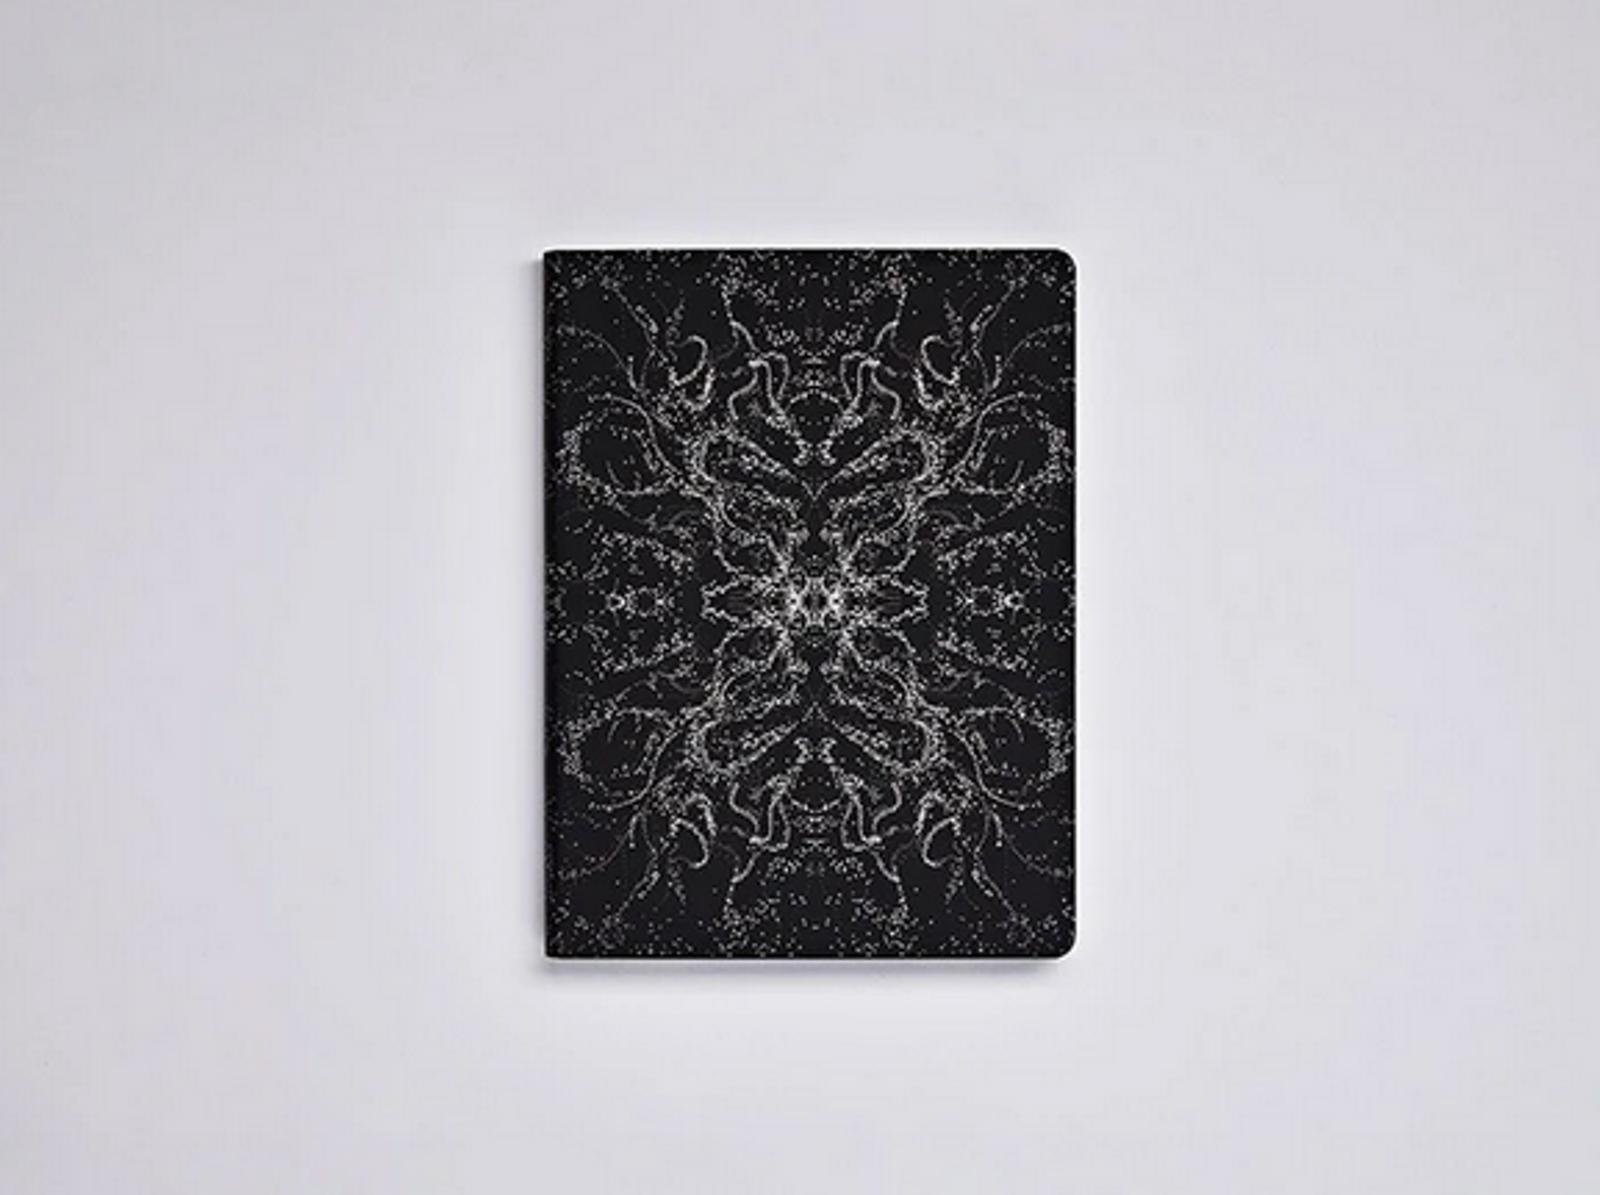 Beauty By Segmeister & Walsh A5 Notebook